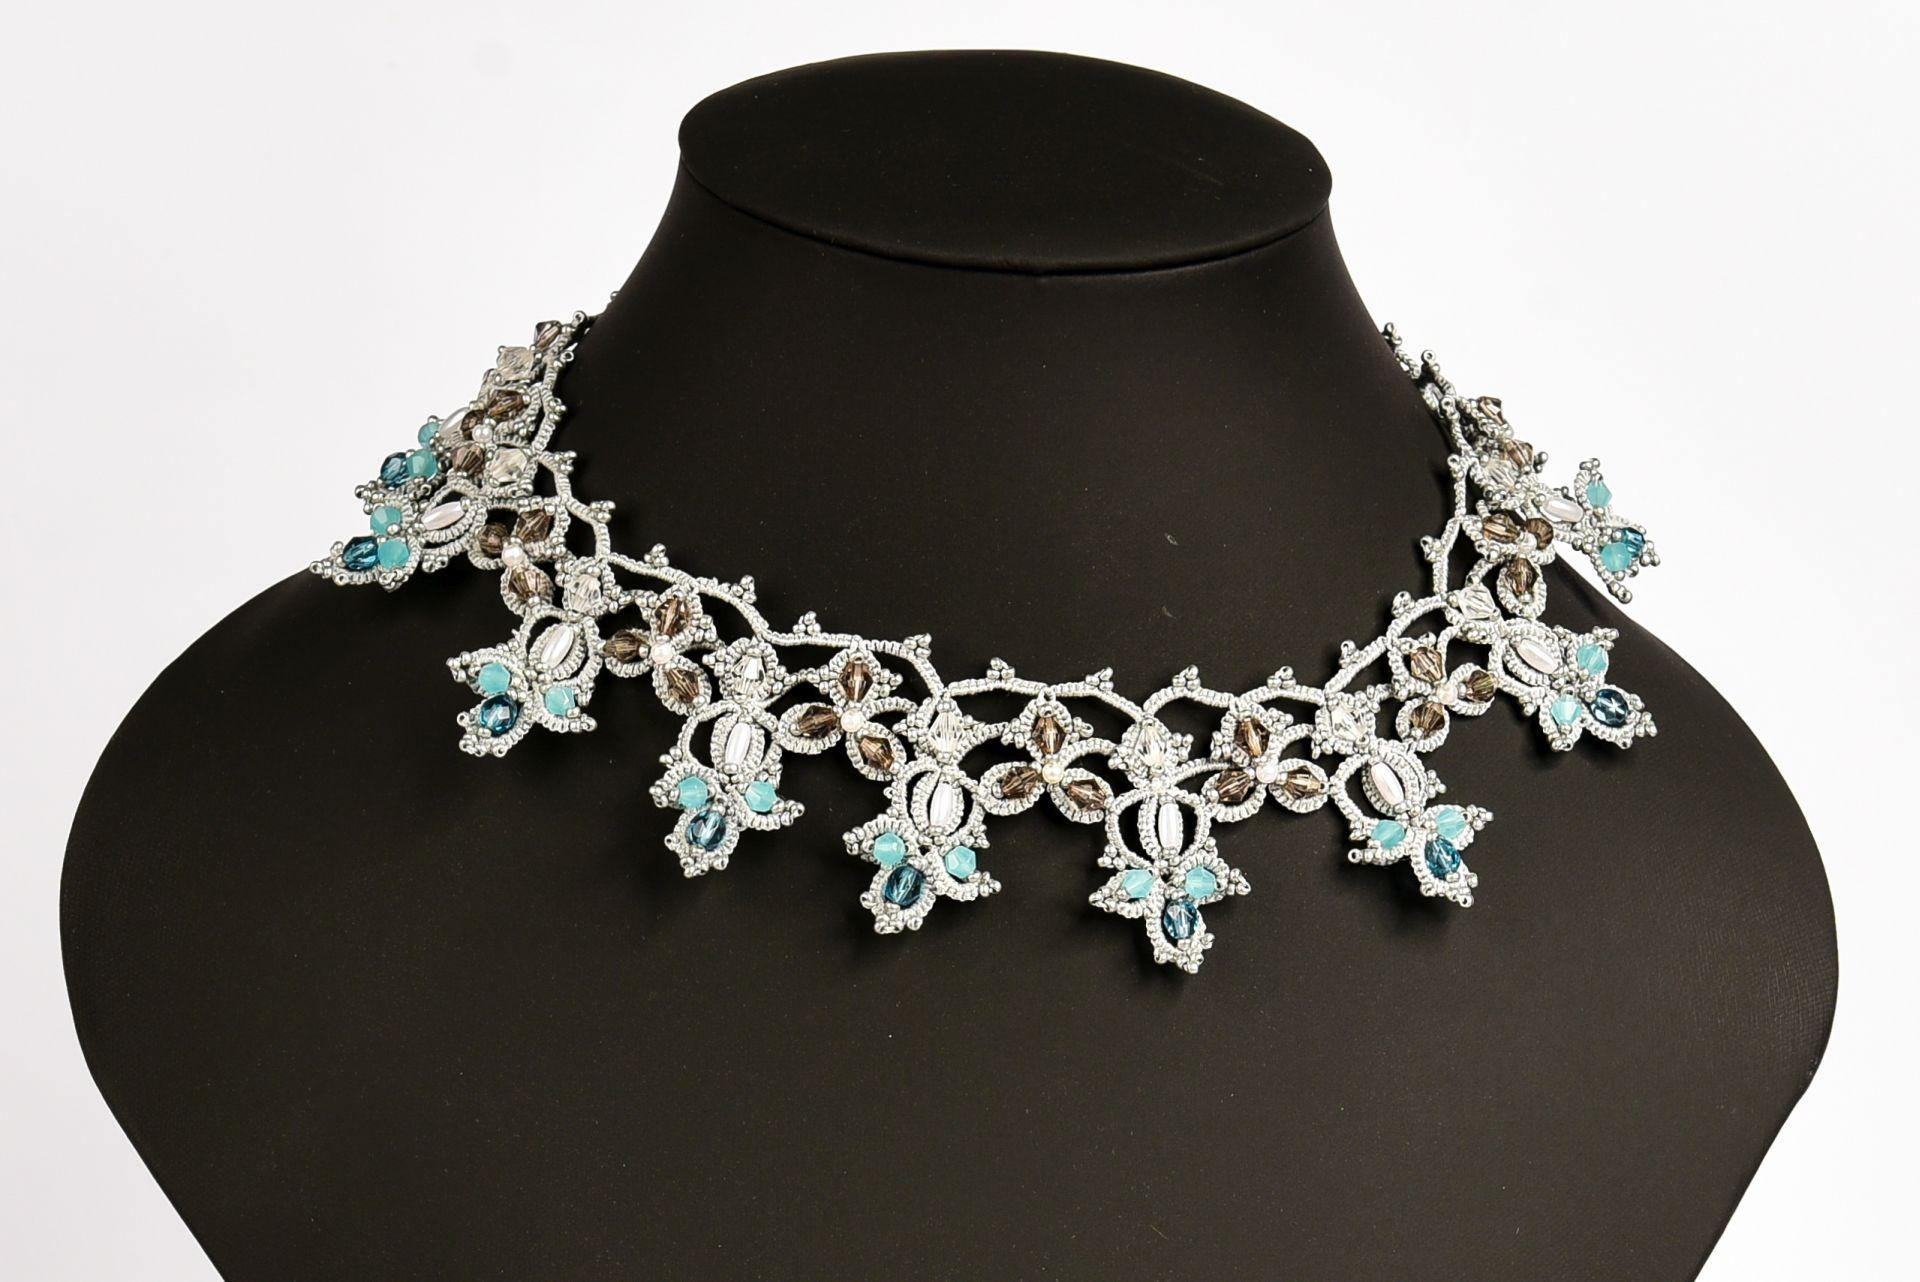 Bulgarian jewellery